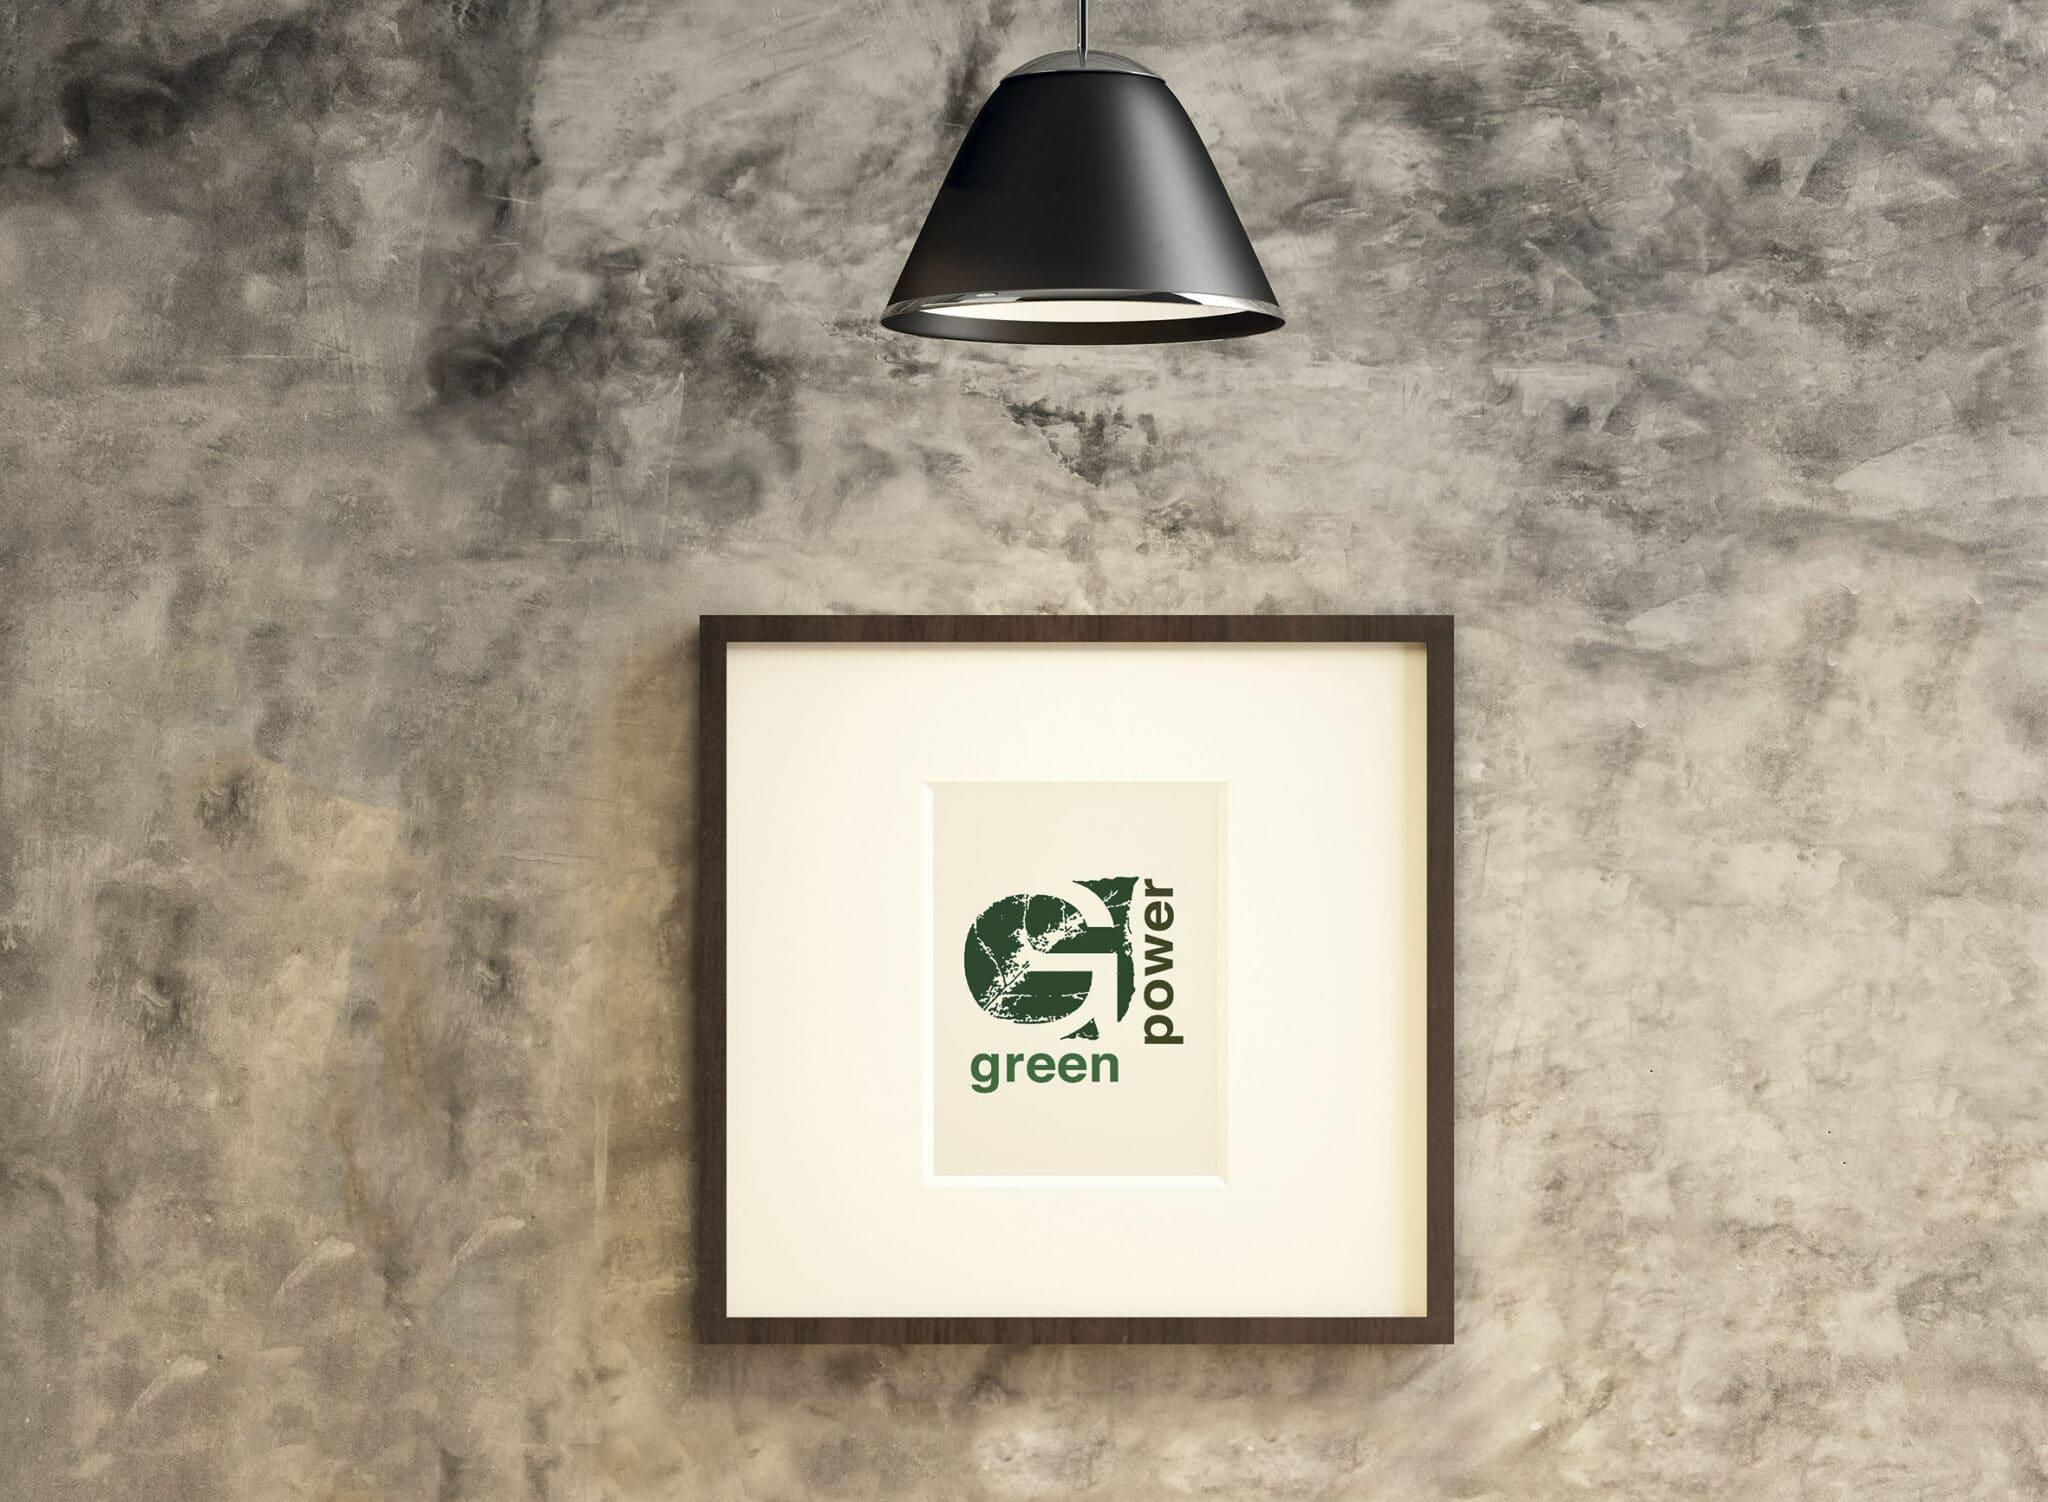 https://www.studiochiesa.it/wp-content/uploads/2020/07/SC-Studio-Chiesa-Communication_Energia-Ambiente-Green-Power-logo.jpg